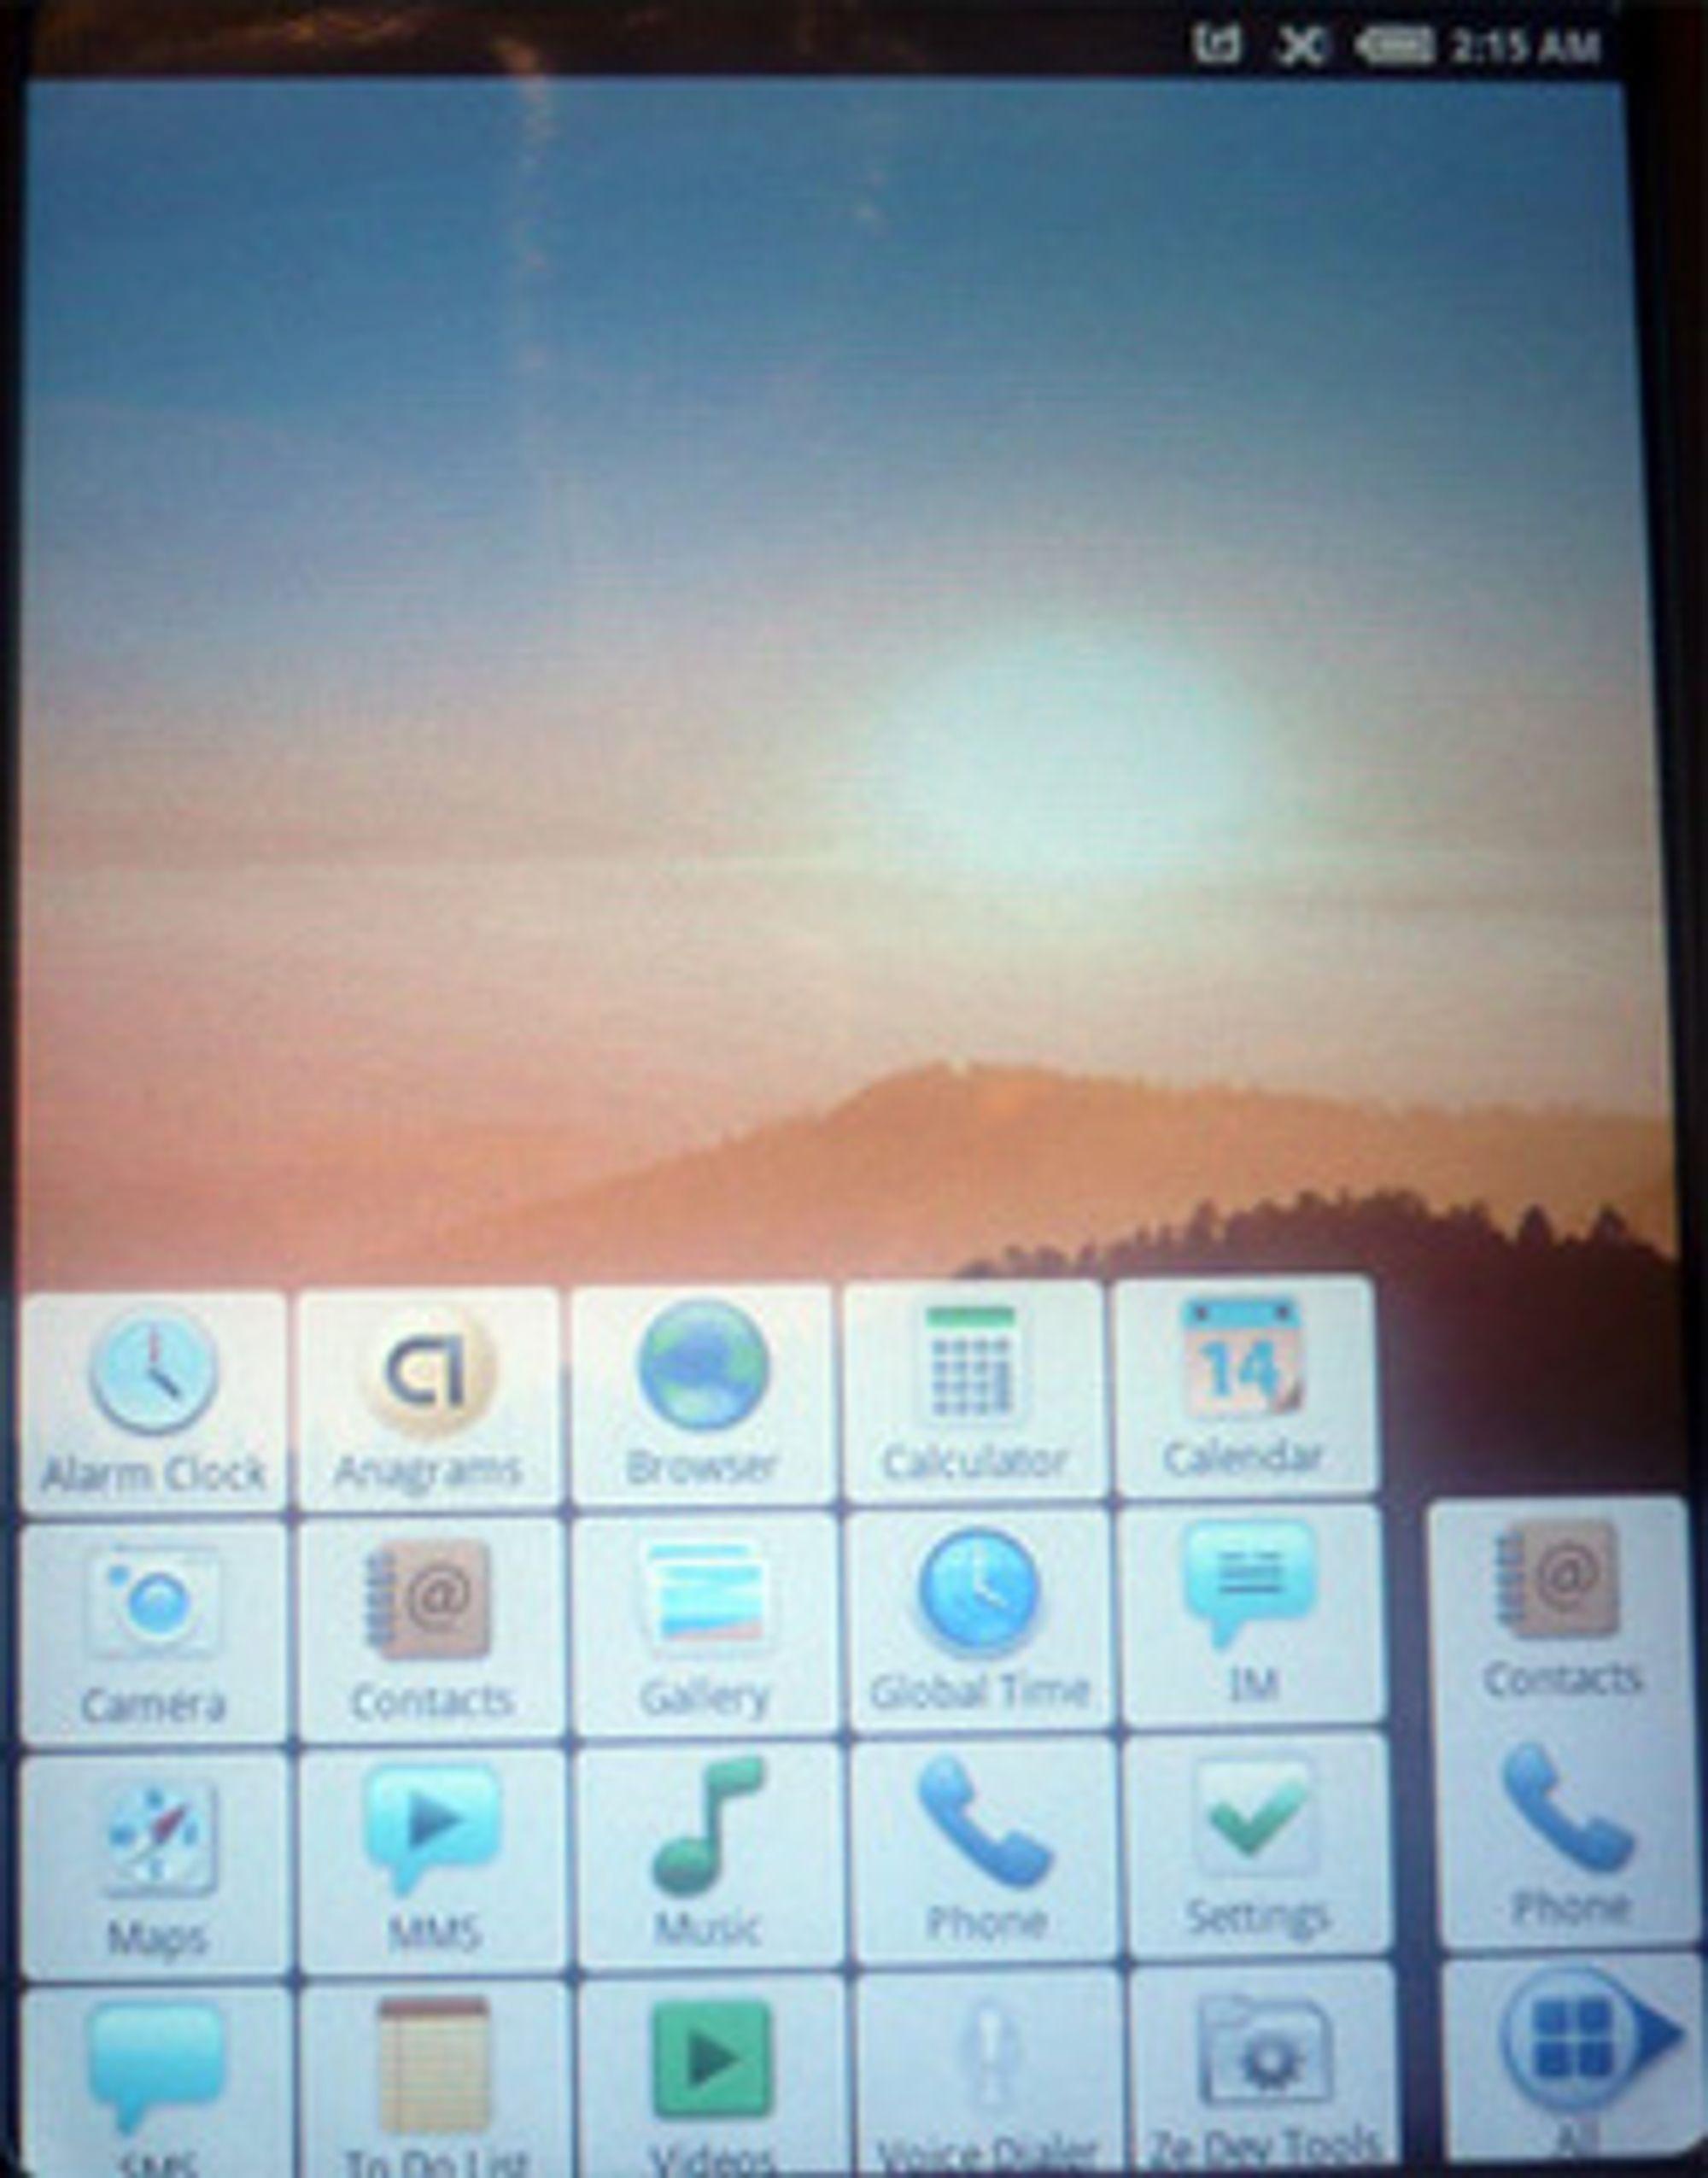 Hovedmenyen til Android. (Foto: Einar Eriksen)